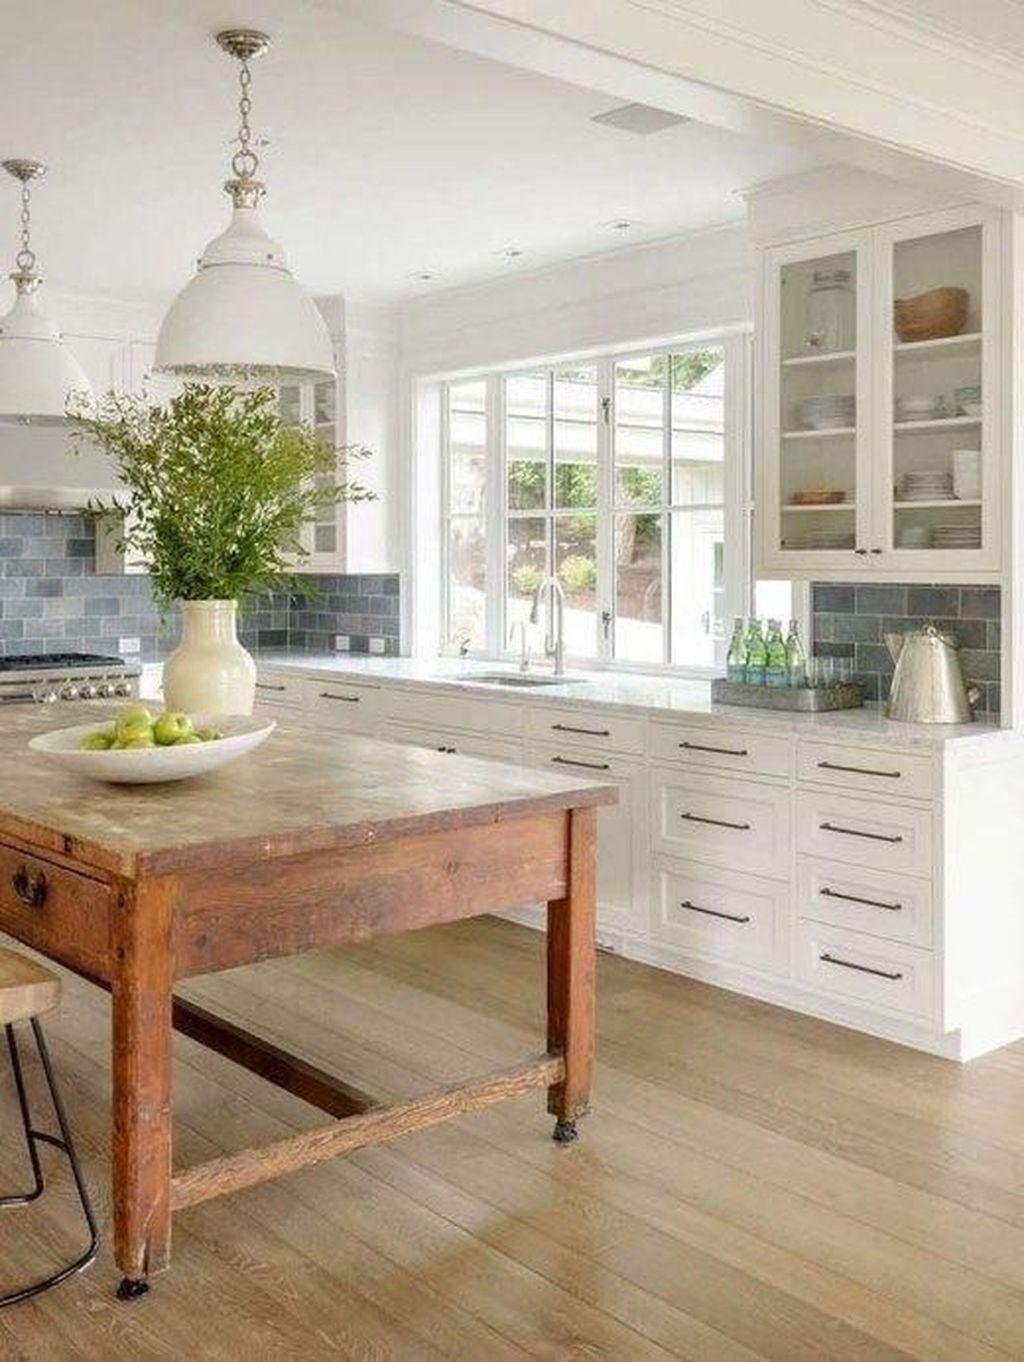 Stunning Farmhouse Interior Design Ideas To Realize Your Dreams 11